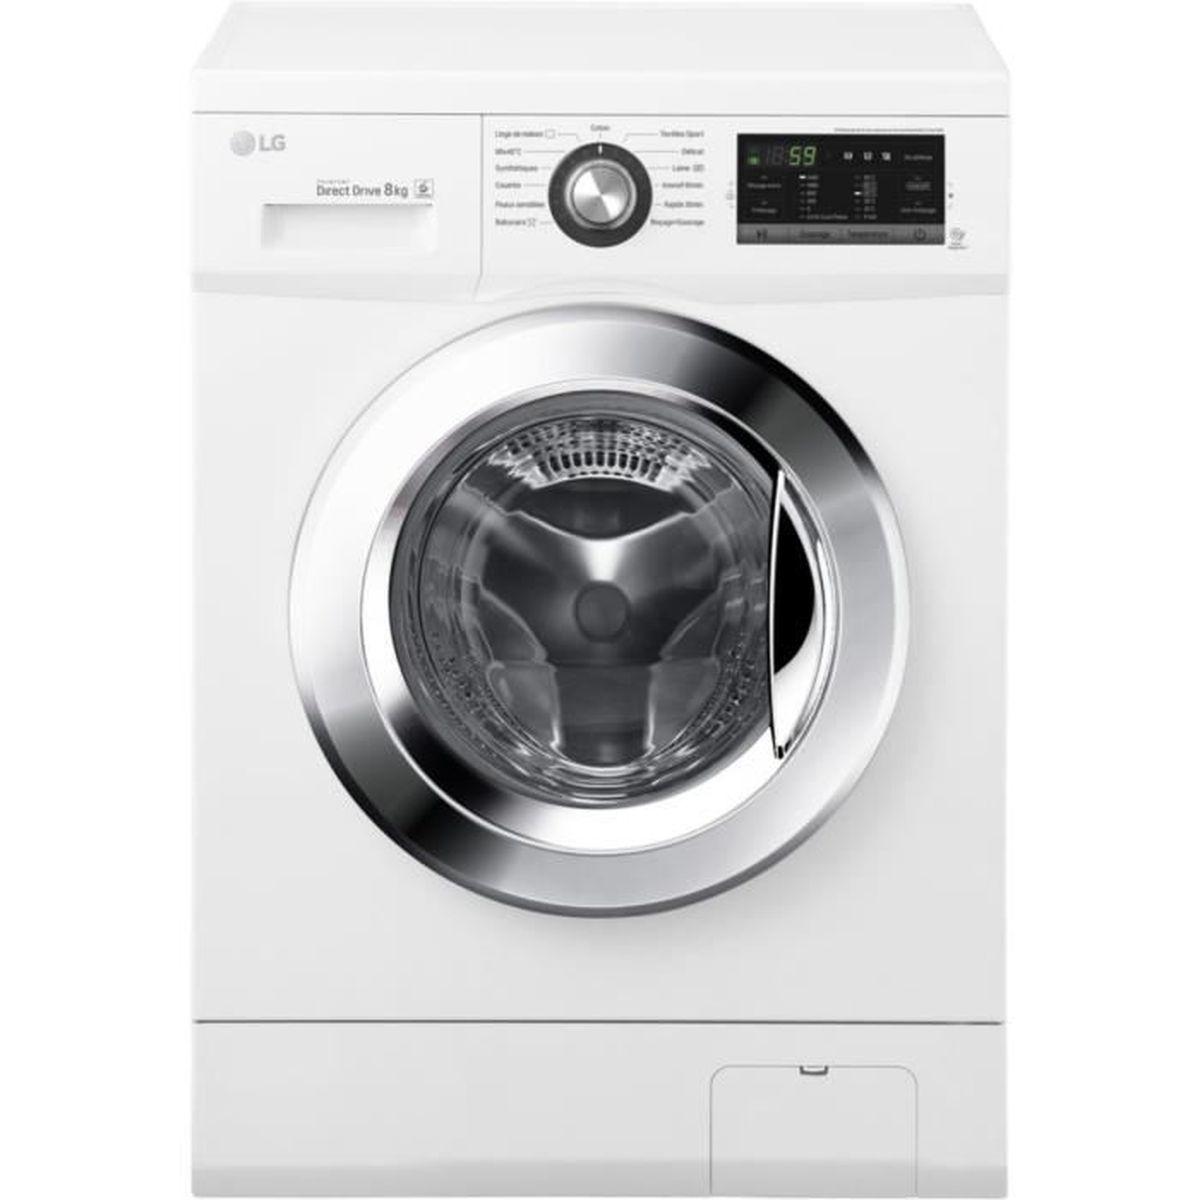 aeg 10kg washing machine manual